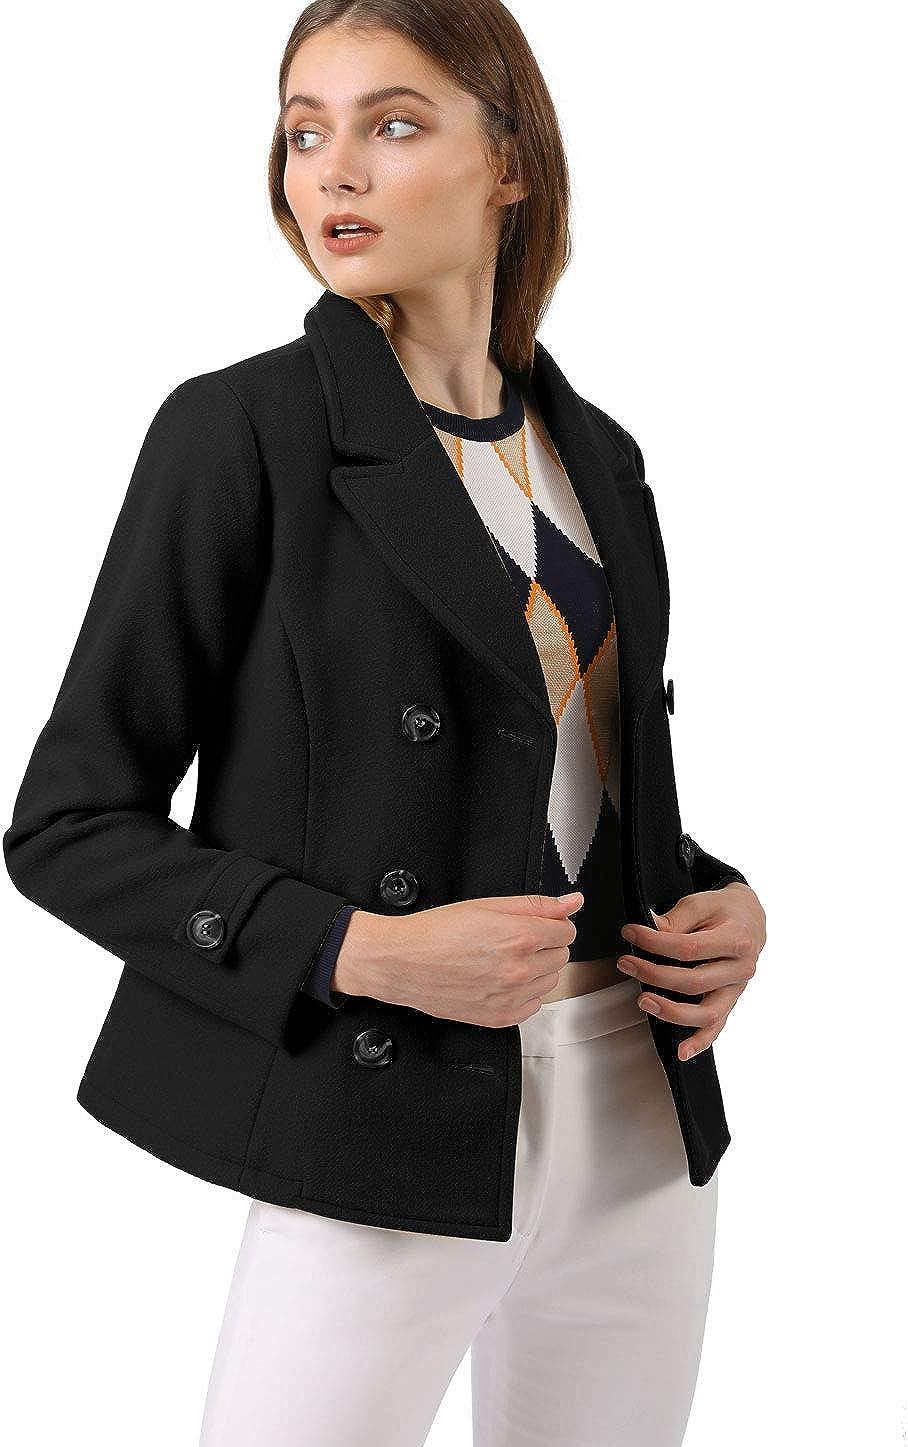 Allegra K Damen Langarm Revers Zweireiher Button Peacoat Mantel Schwarz